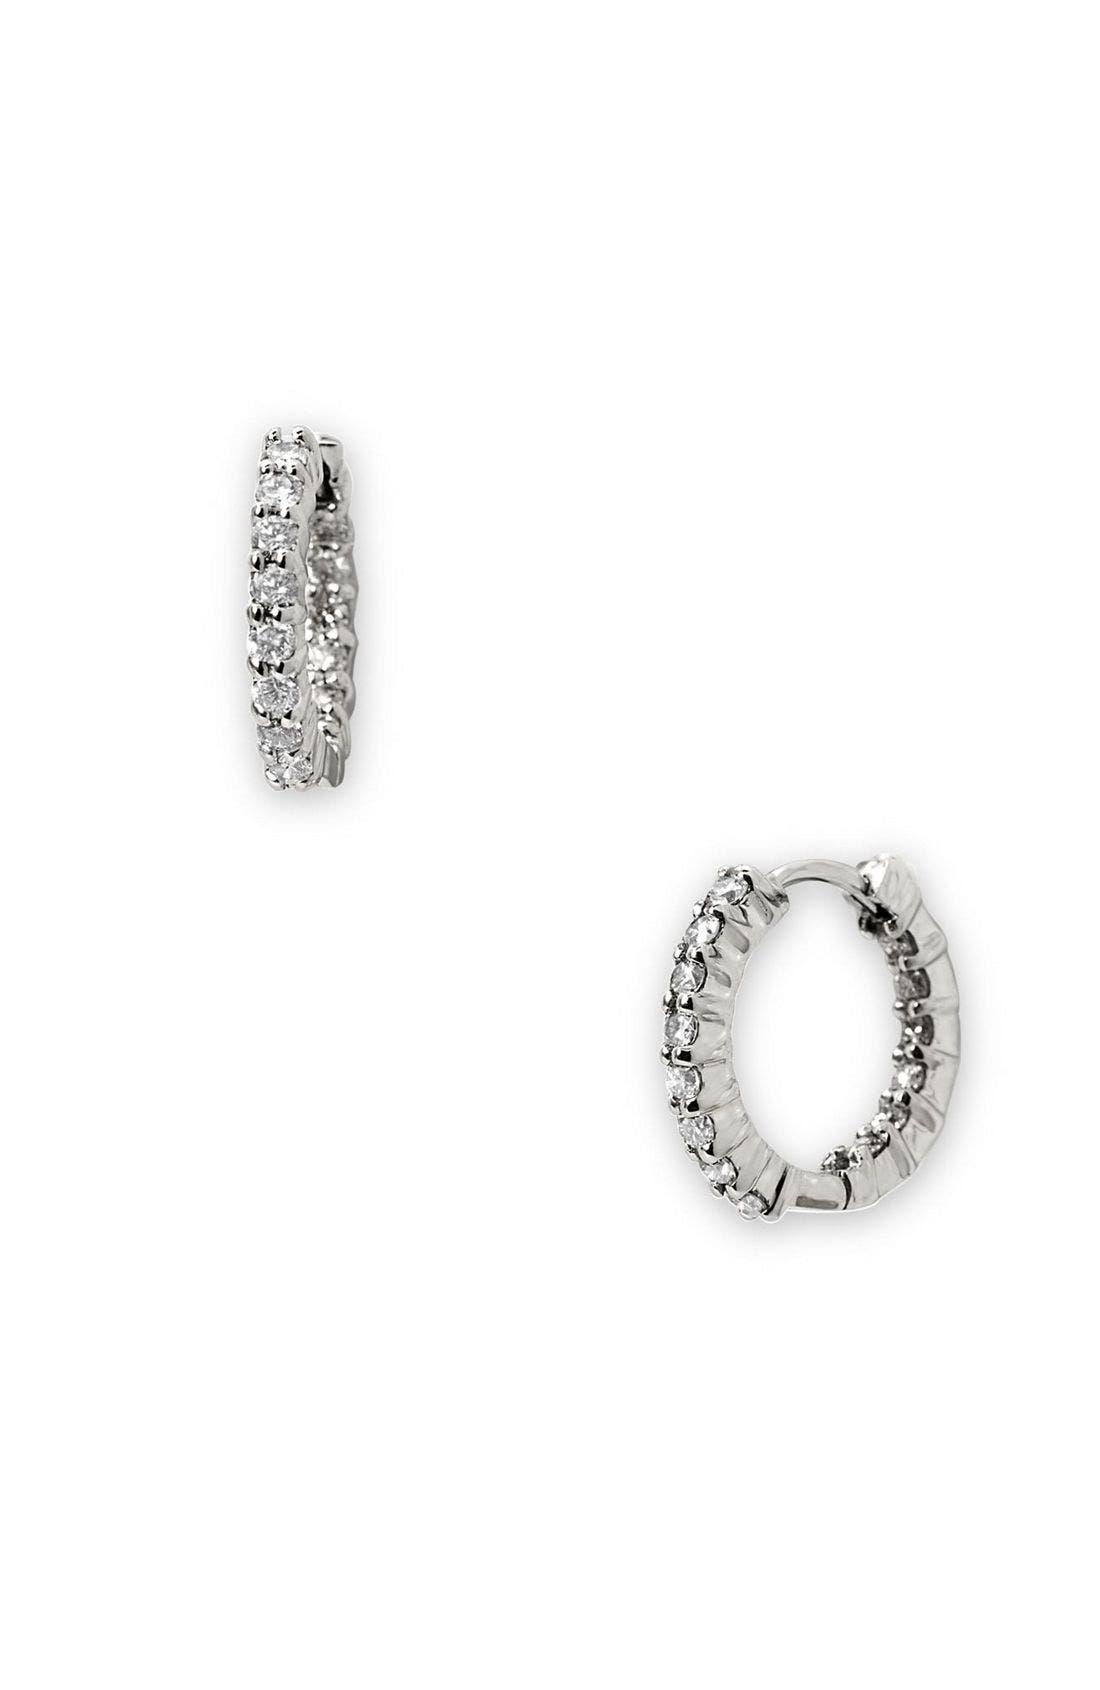 12mm Small Diamond Hoop Earrings,                         Main,                         color,